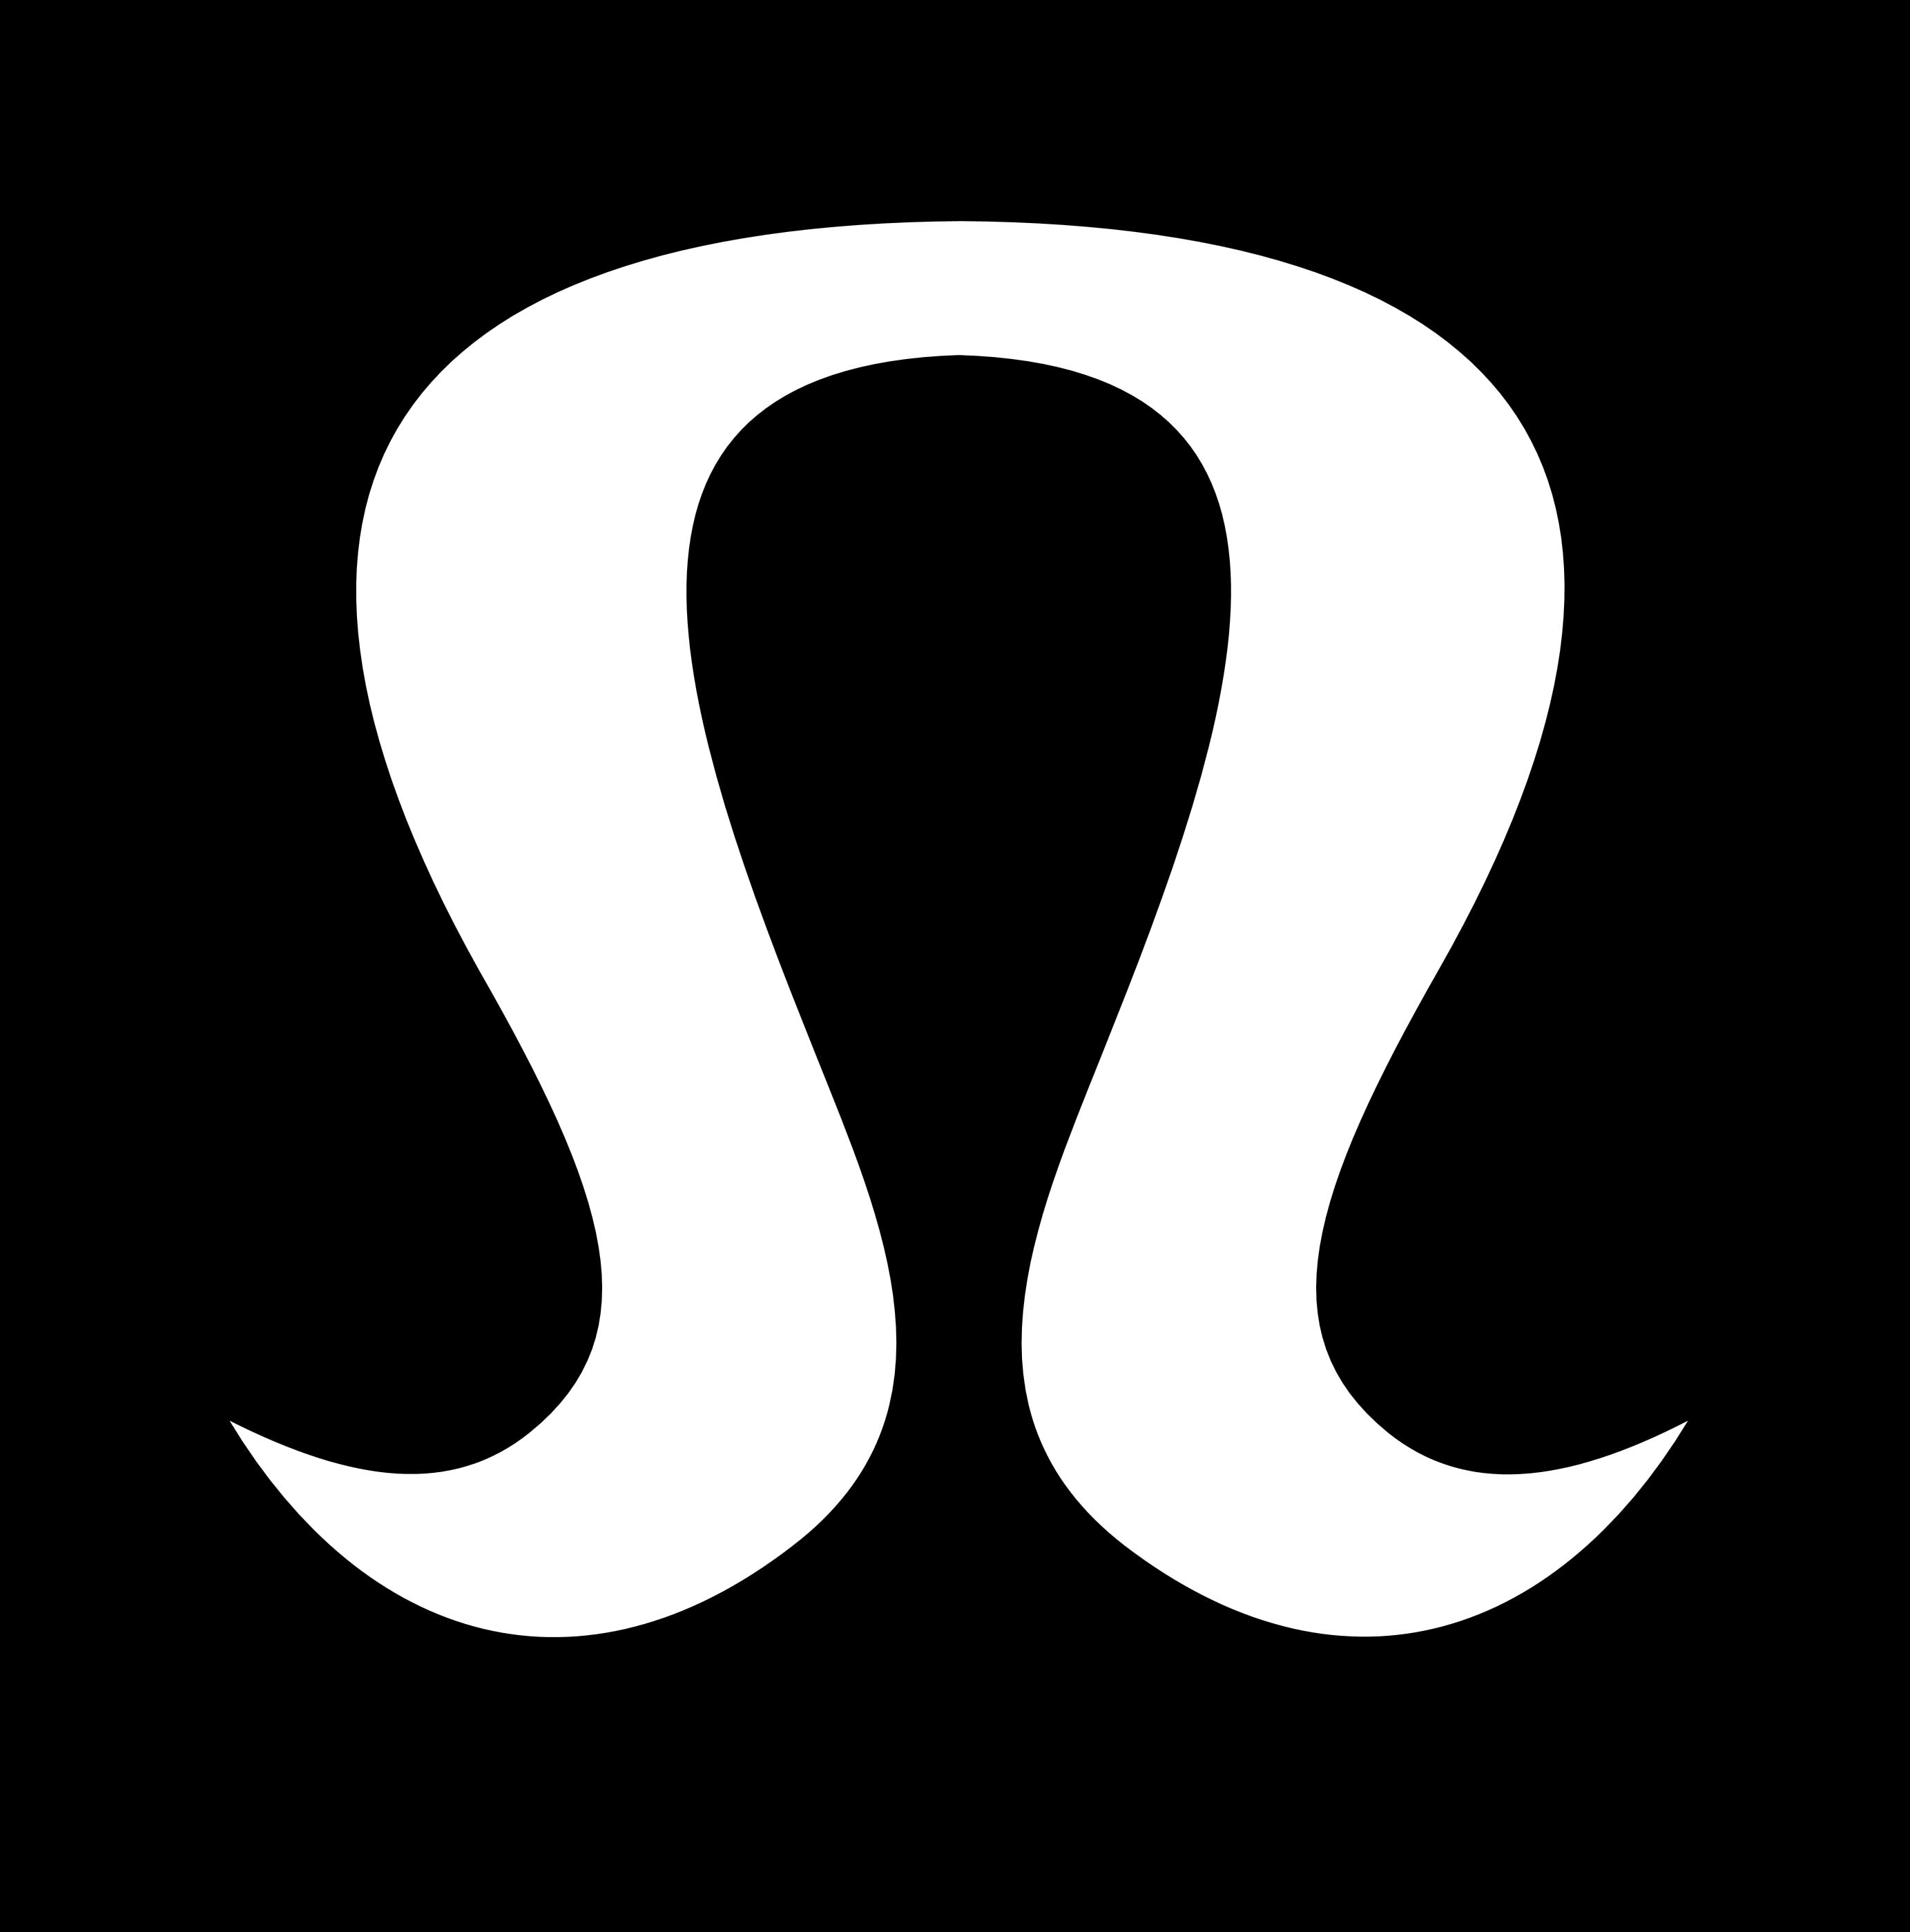 Pin By Chloe On Hughes Namecards Lululemon Men Logo Discount Lululemon